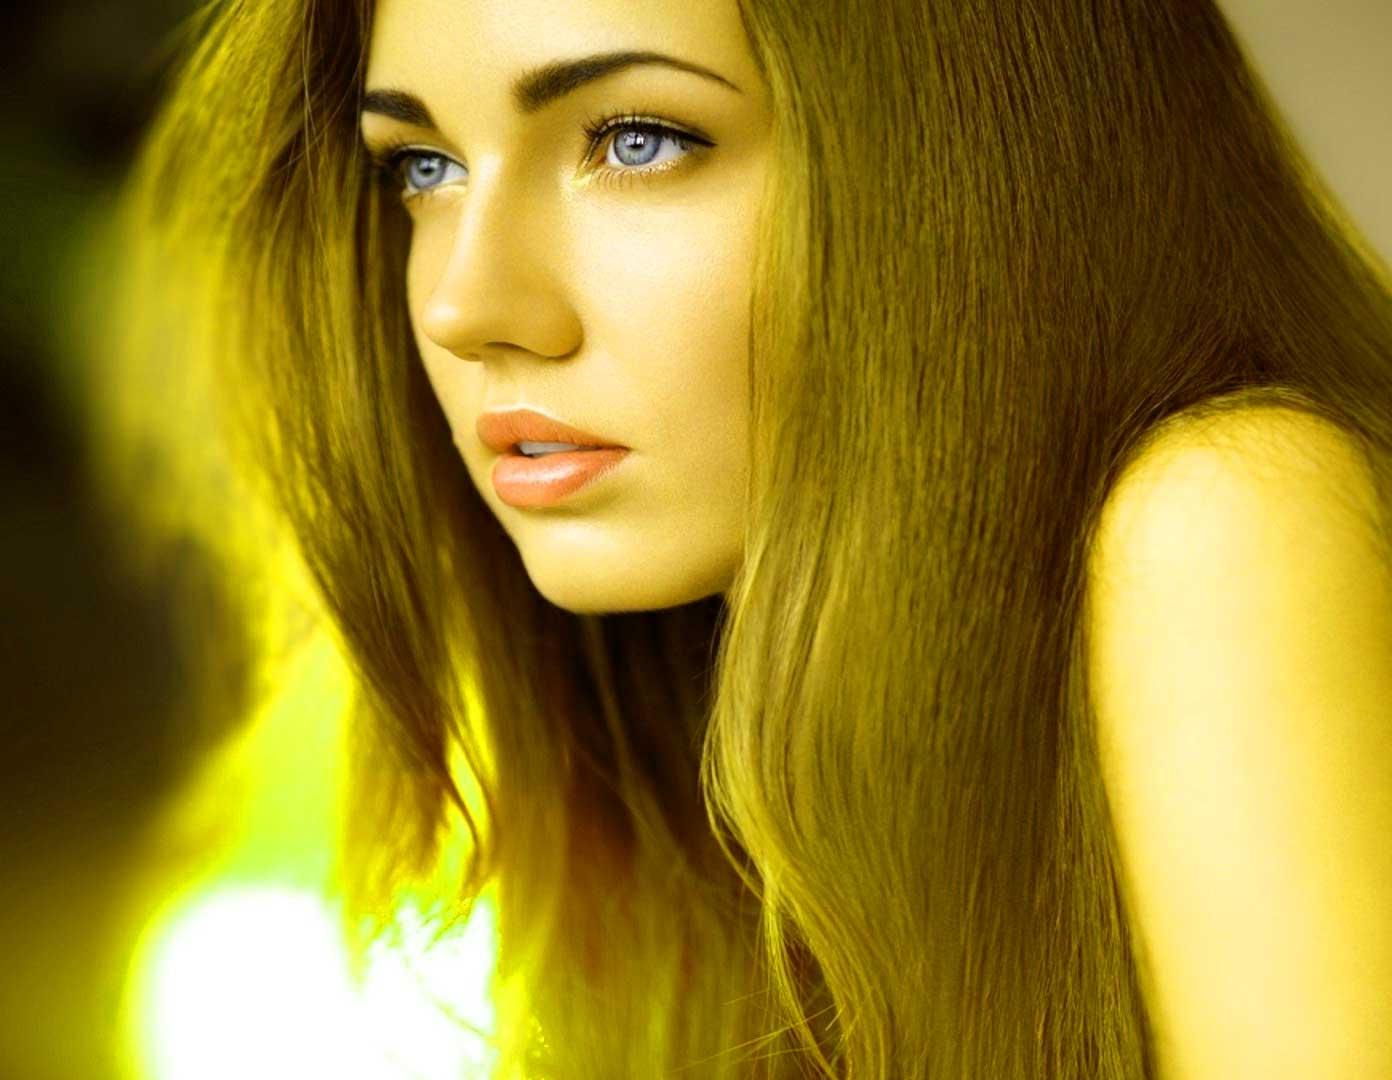 very cute beautiful girl images Pics Download